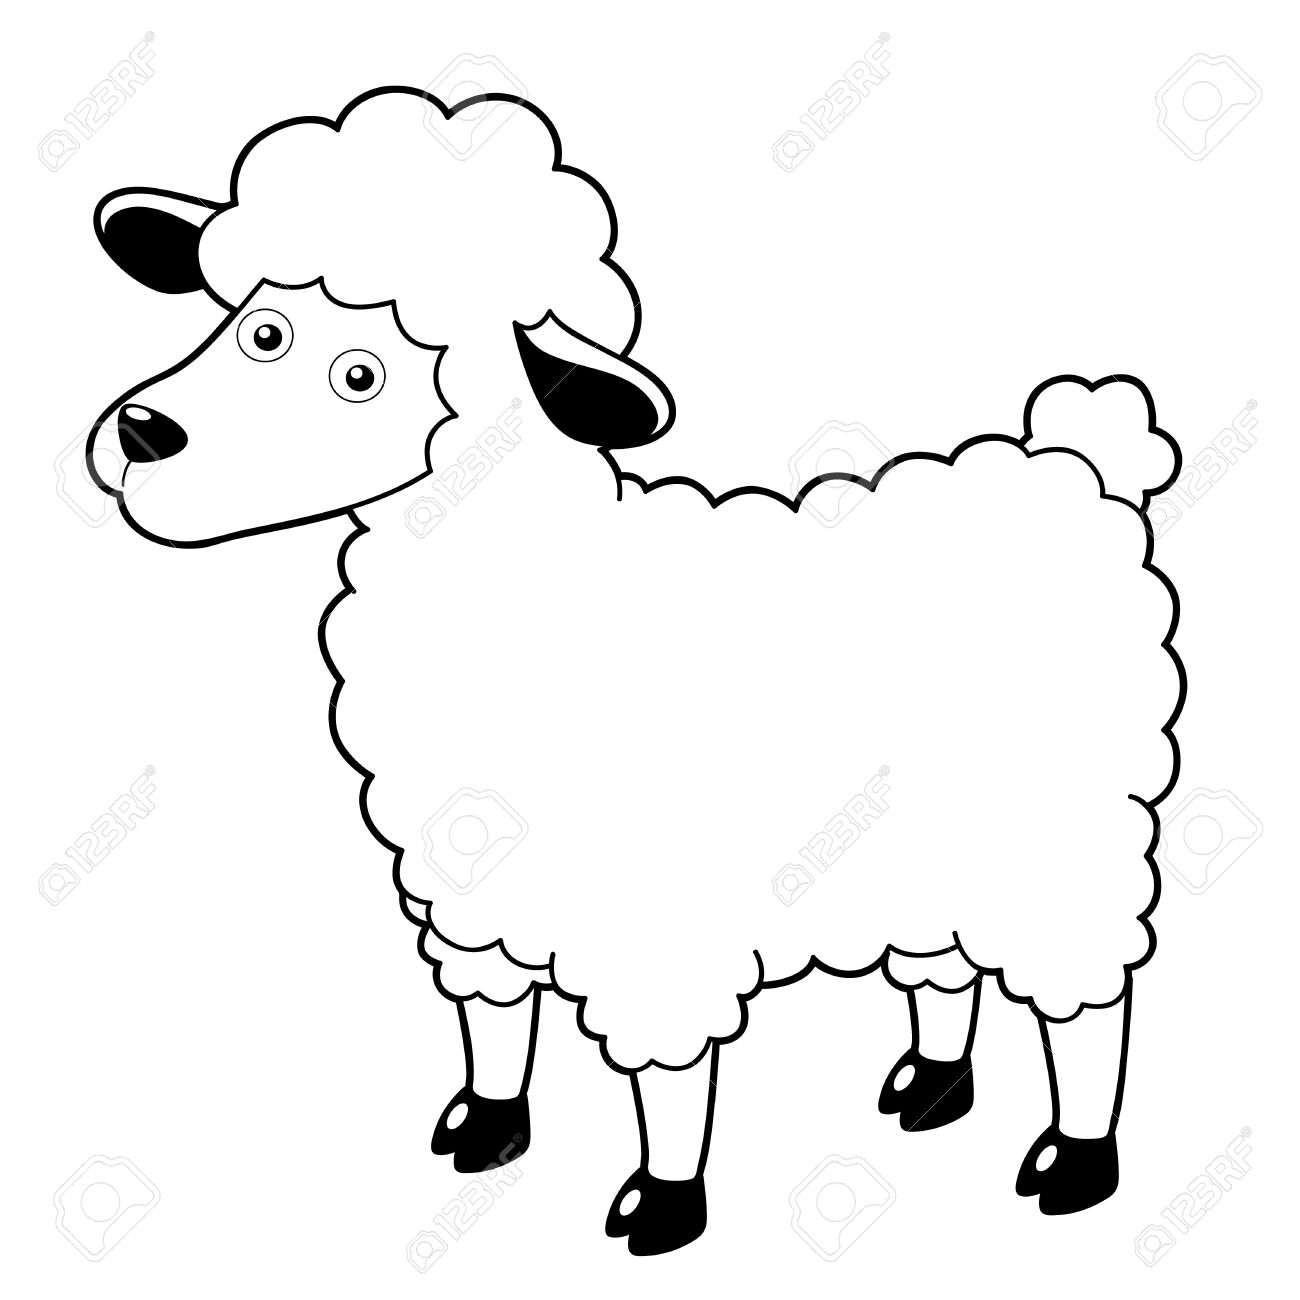 1300x1300 Drawn Sheep Cartoon Black And White